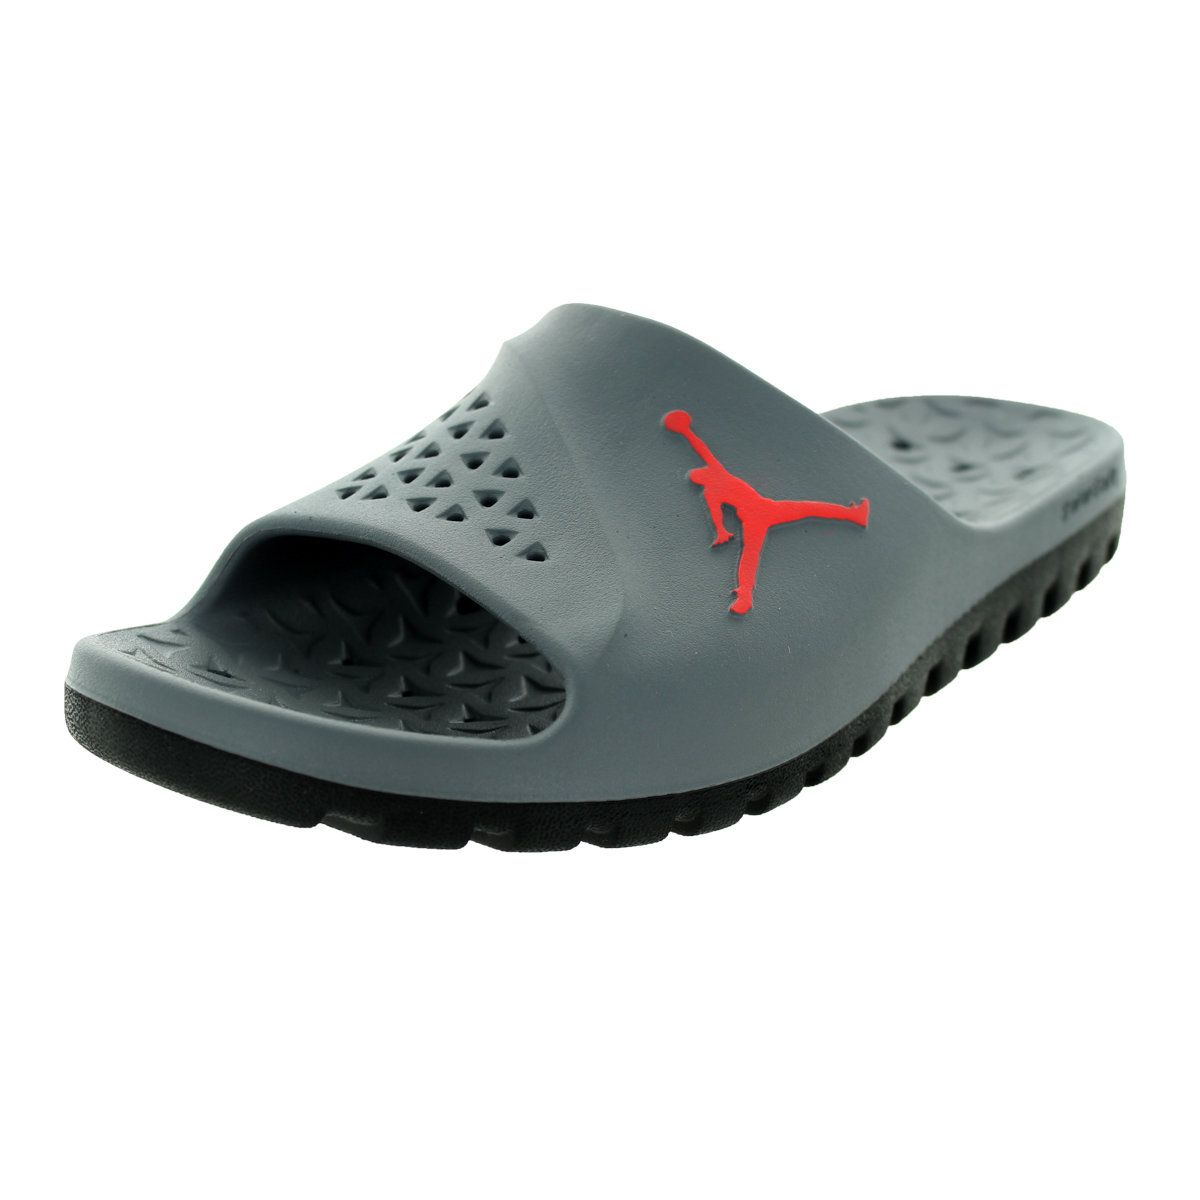 7797a9f09c9 Nike Jordan Men s Jordan Super.Fly Team Synthetic Slide Sandals ...